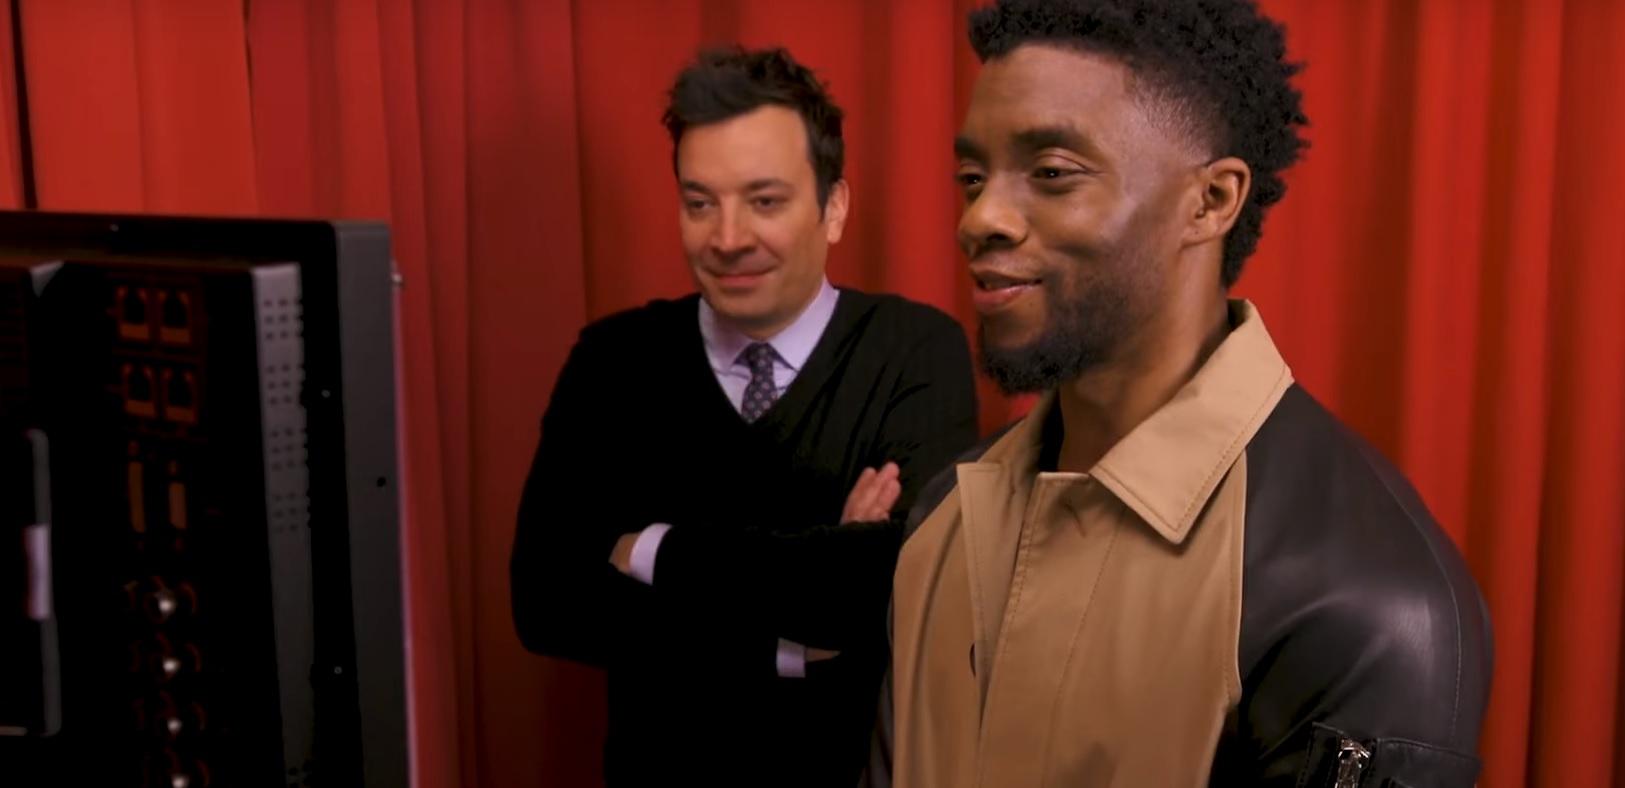 Fofo, Chadwick Boseman surpreende fãs do 'Pantera Negra' no Tonight Show; assista!